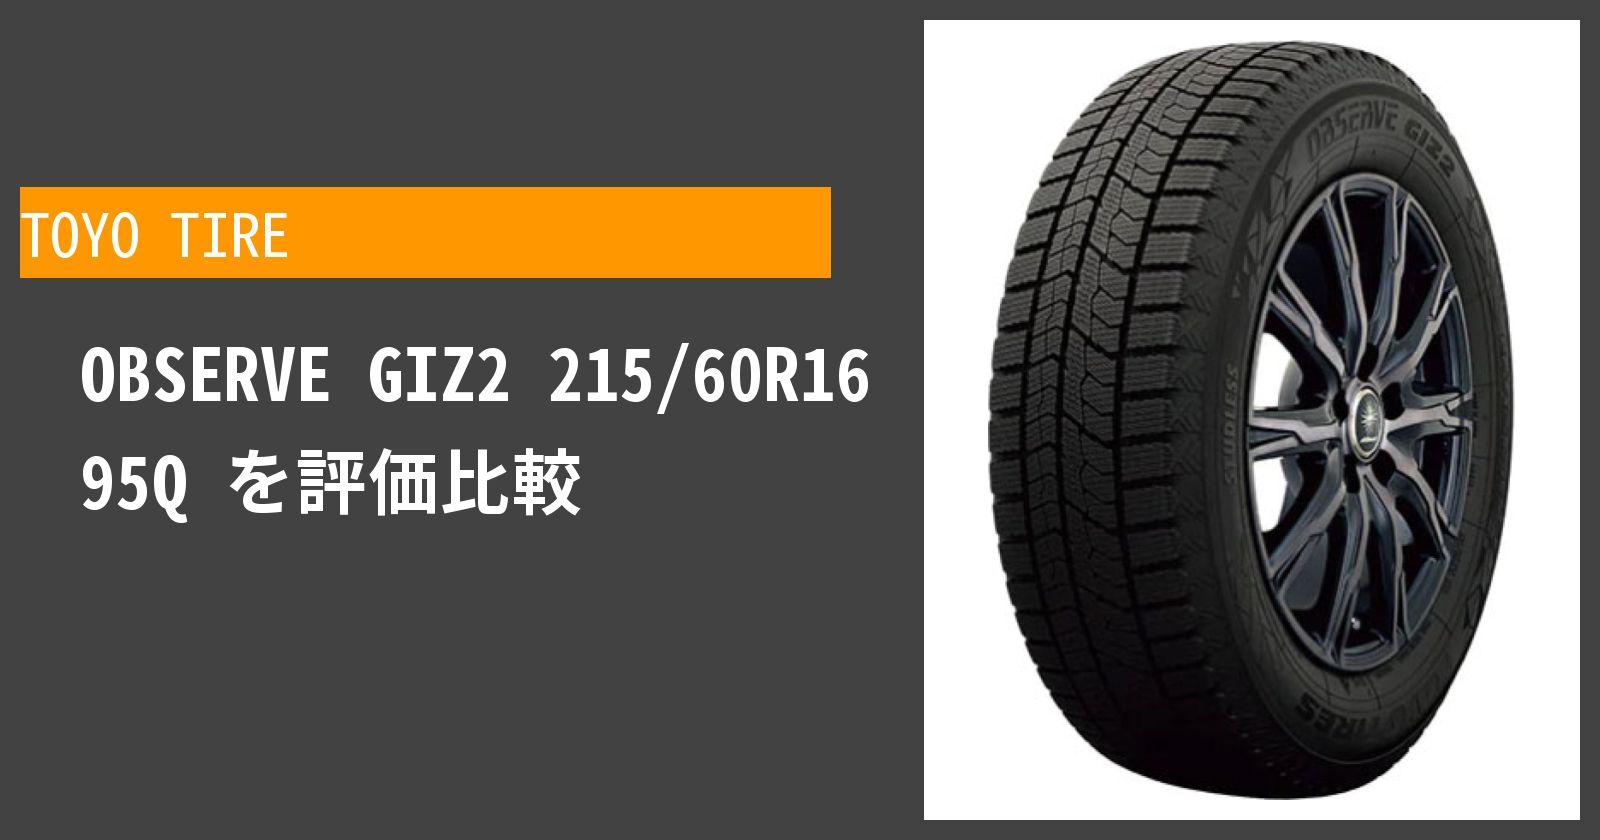 OBSERVE GIZ2 215/60R16 95Qを徹底評価